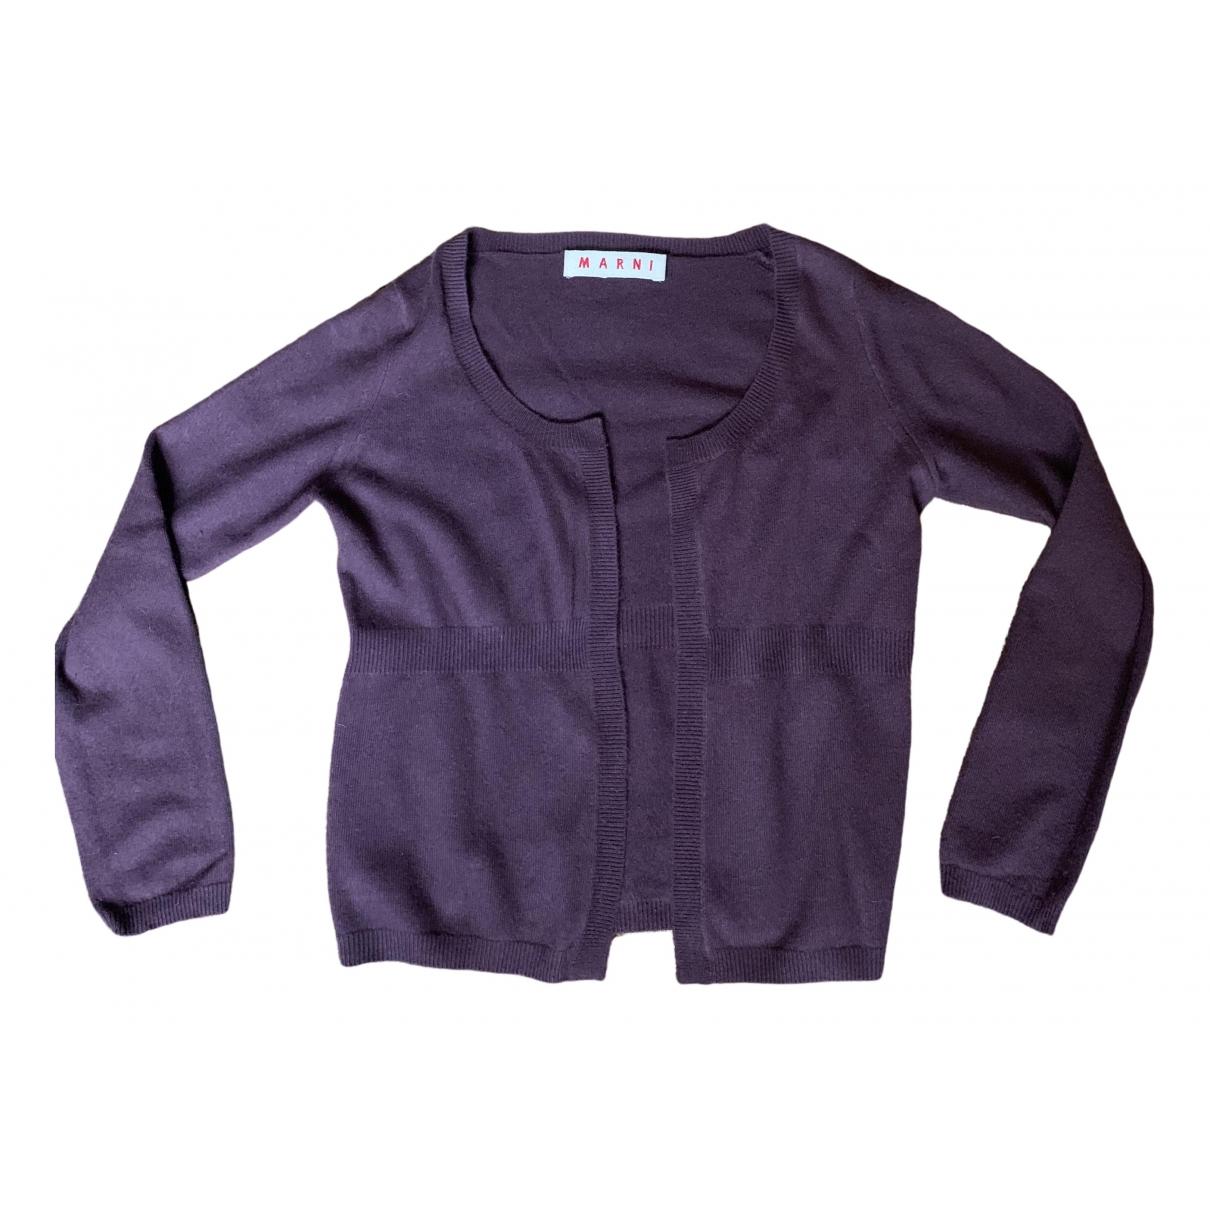 Marni \N Pullover in  Lila Kaschmir